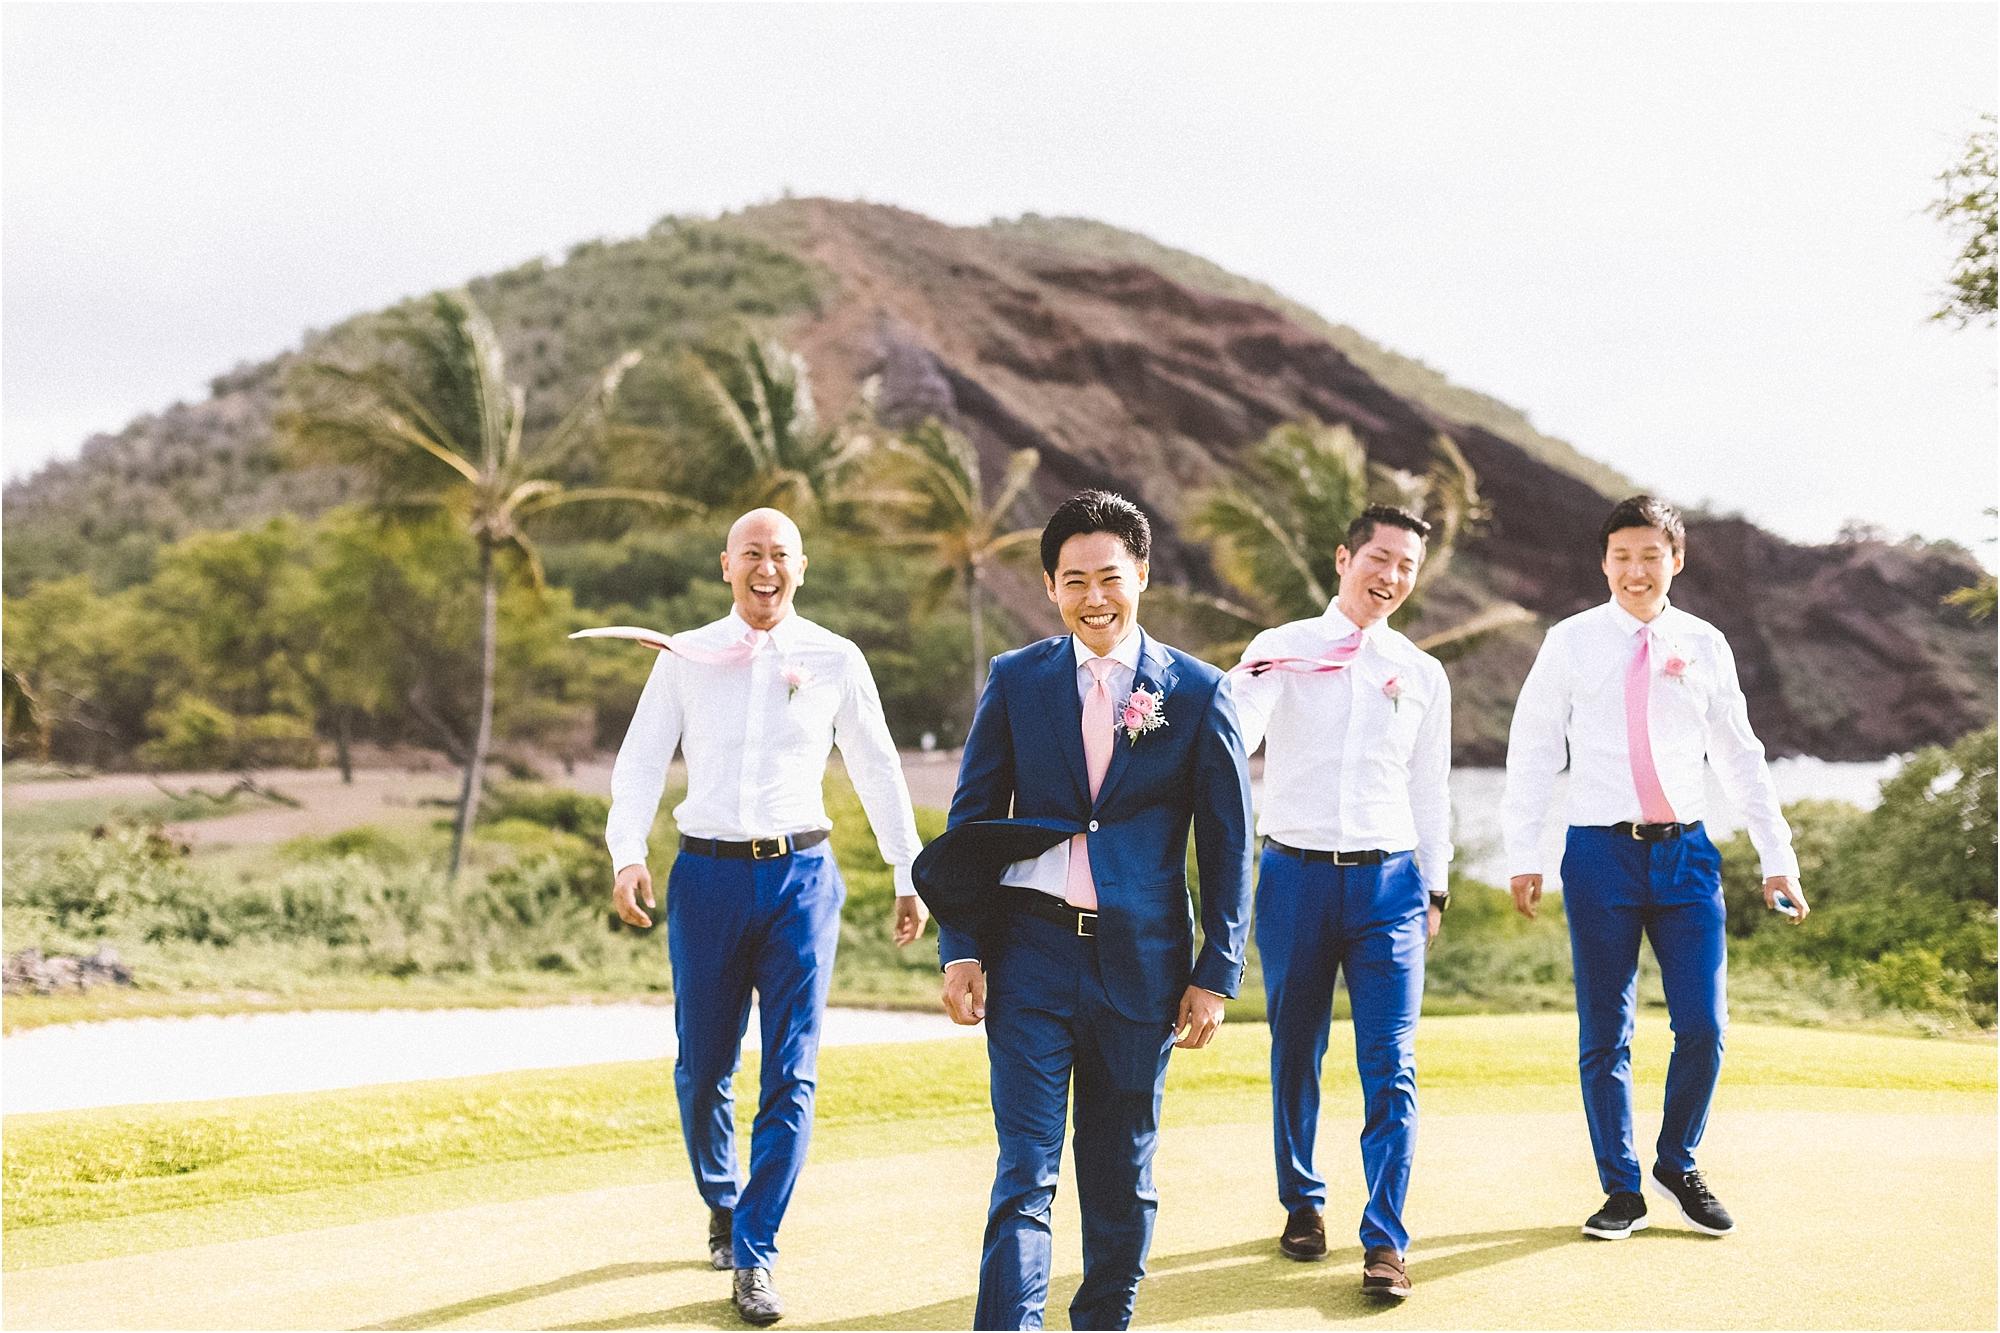 angie-diaz-photography-maui-hawaii-destination-wedding-makena-golf-beach-club_0013.jpg